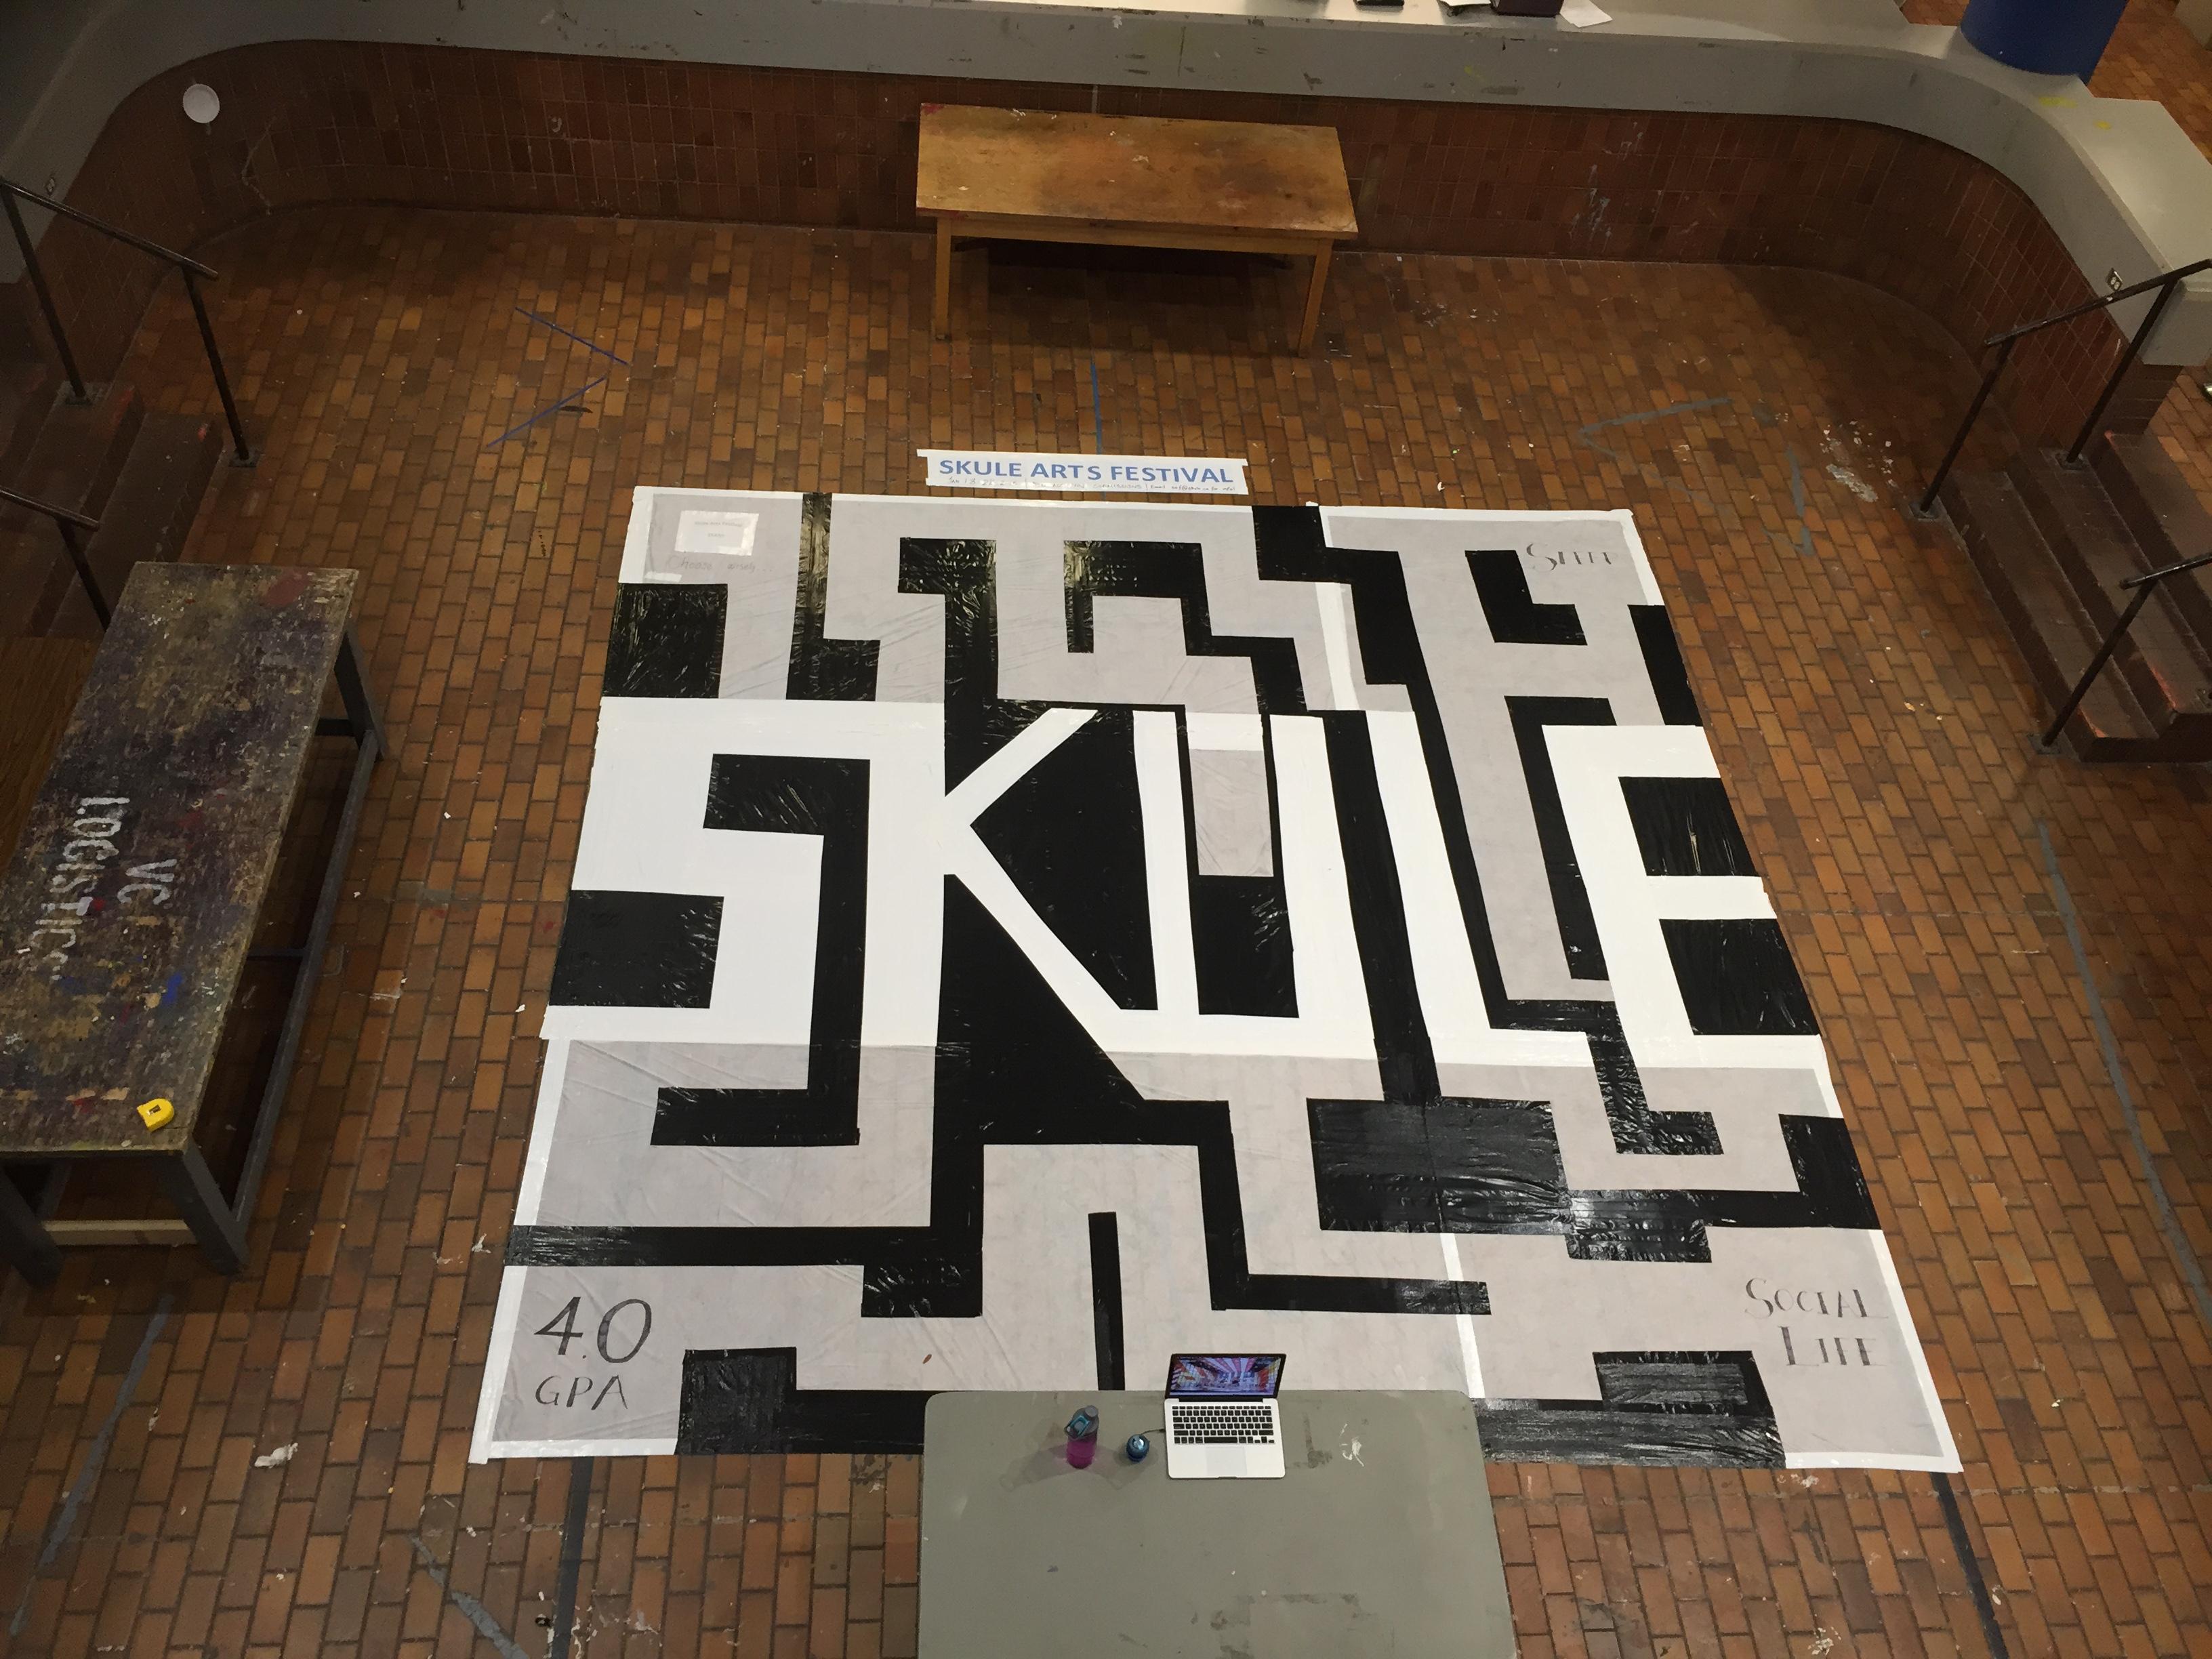 Overhead view of final maze